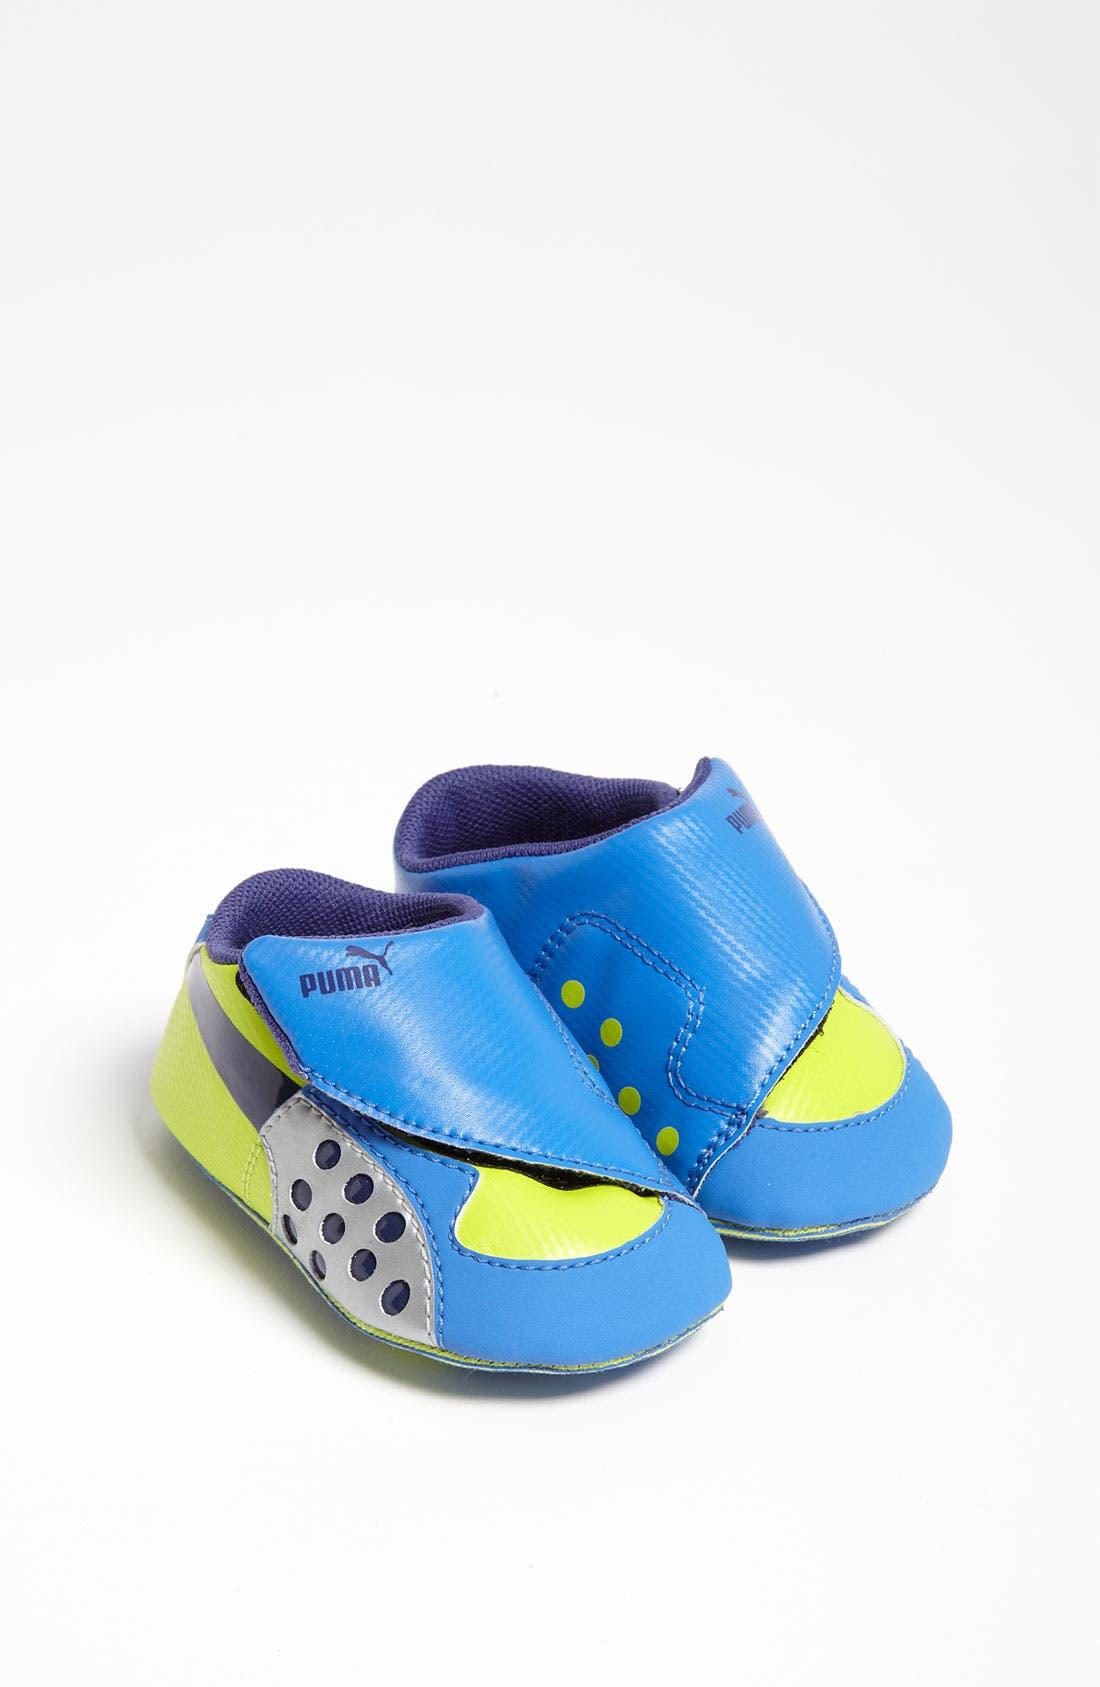 Alternate Image 1 Selected - PUMA 'Faas 300 Lil' Wrap' Crib Sneaker (Baby)